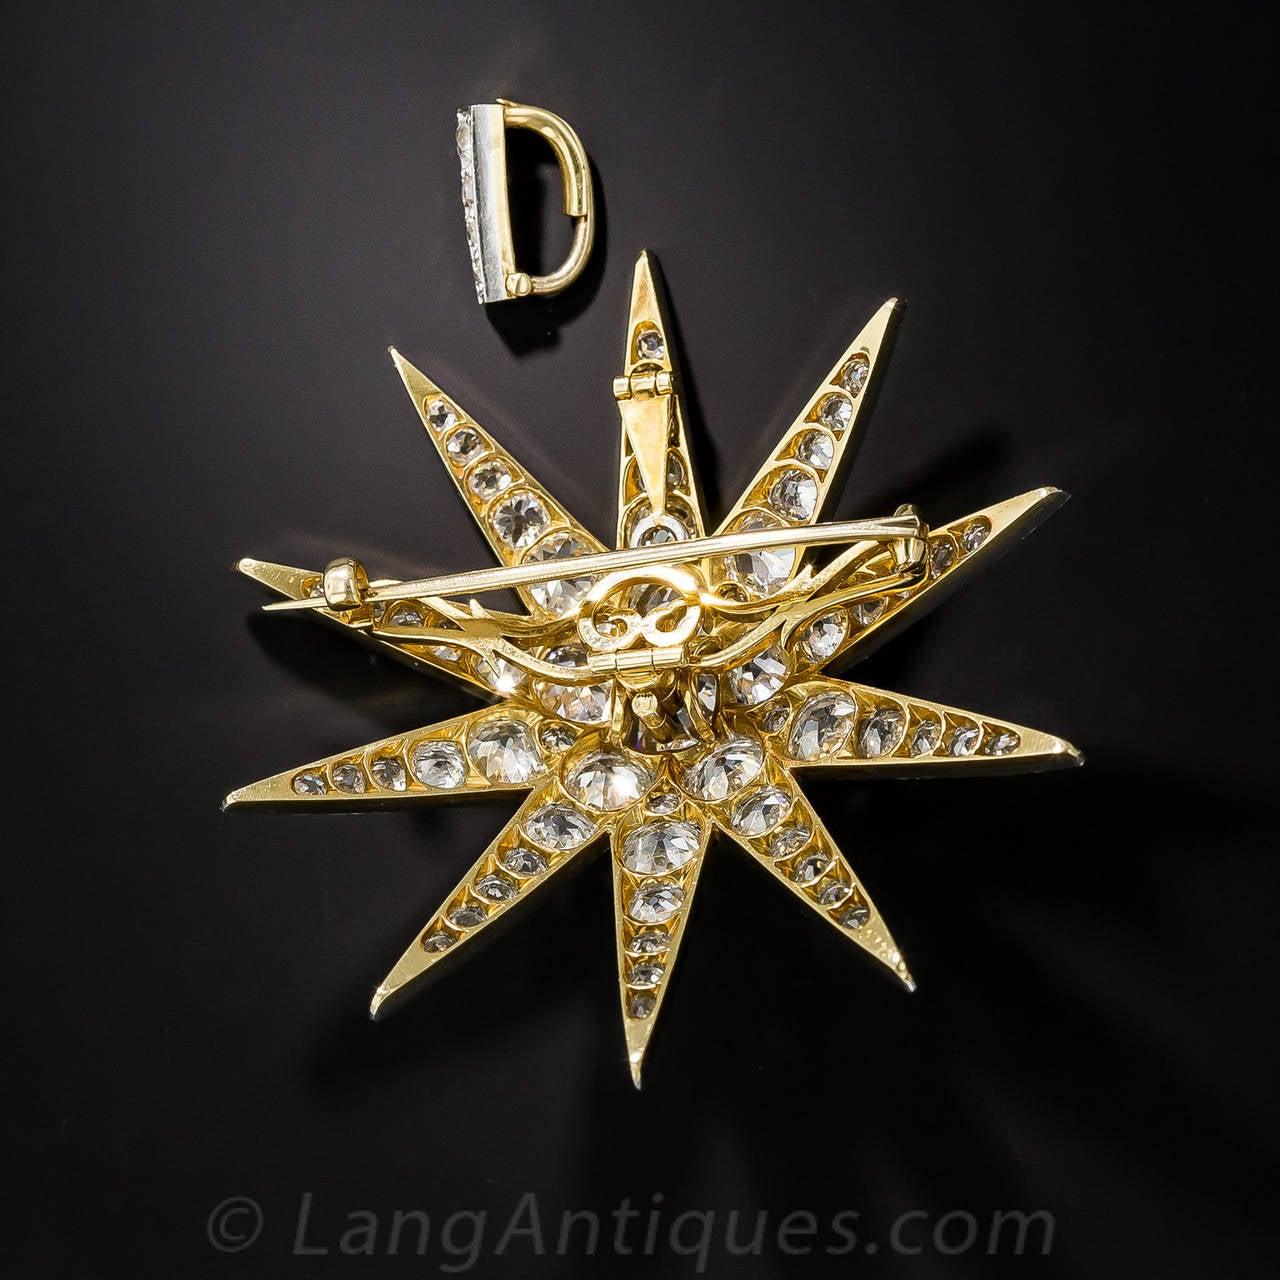 Victorian 2.13 Carat Cushion Cut Diamond Platinum Star Brooch Pendant - GIA Cert 5